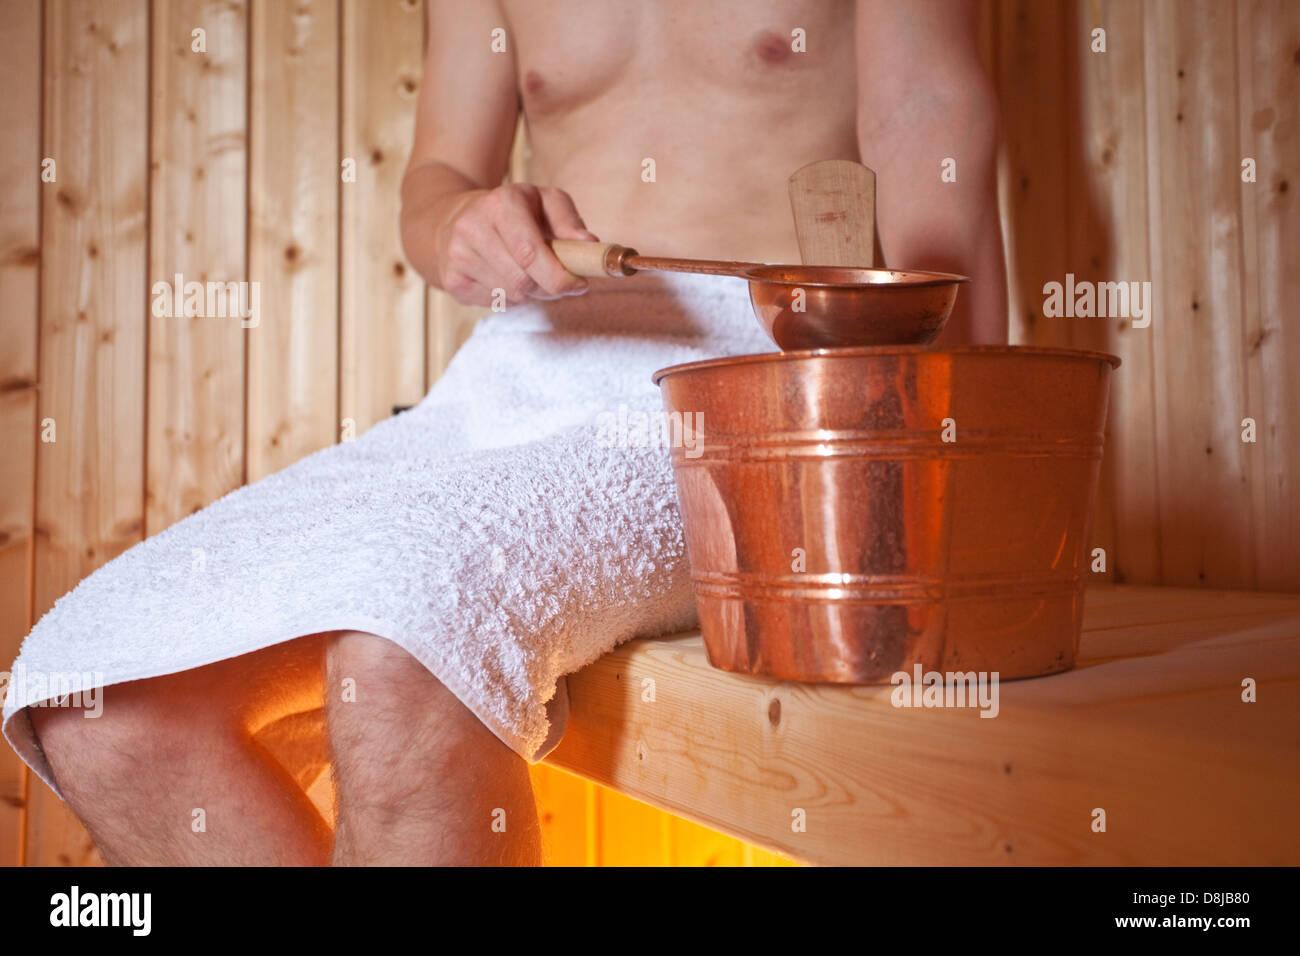 Finnish sauna - Stock Image